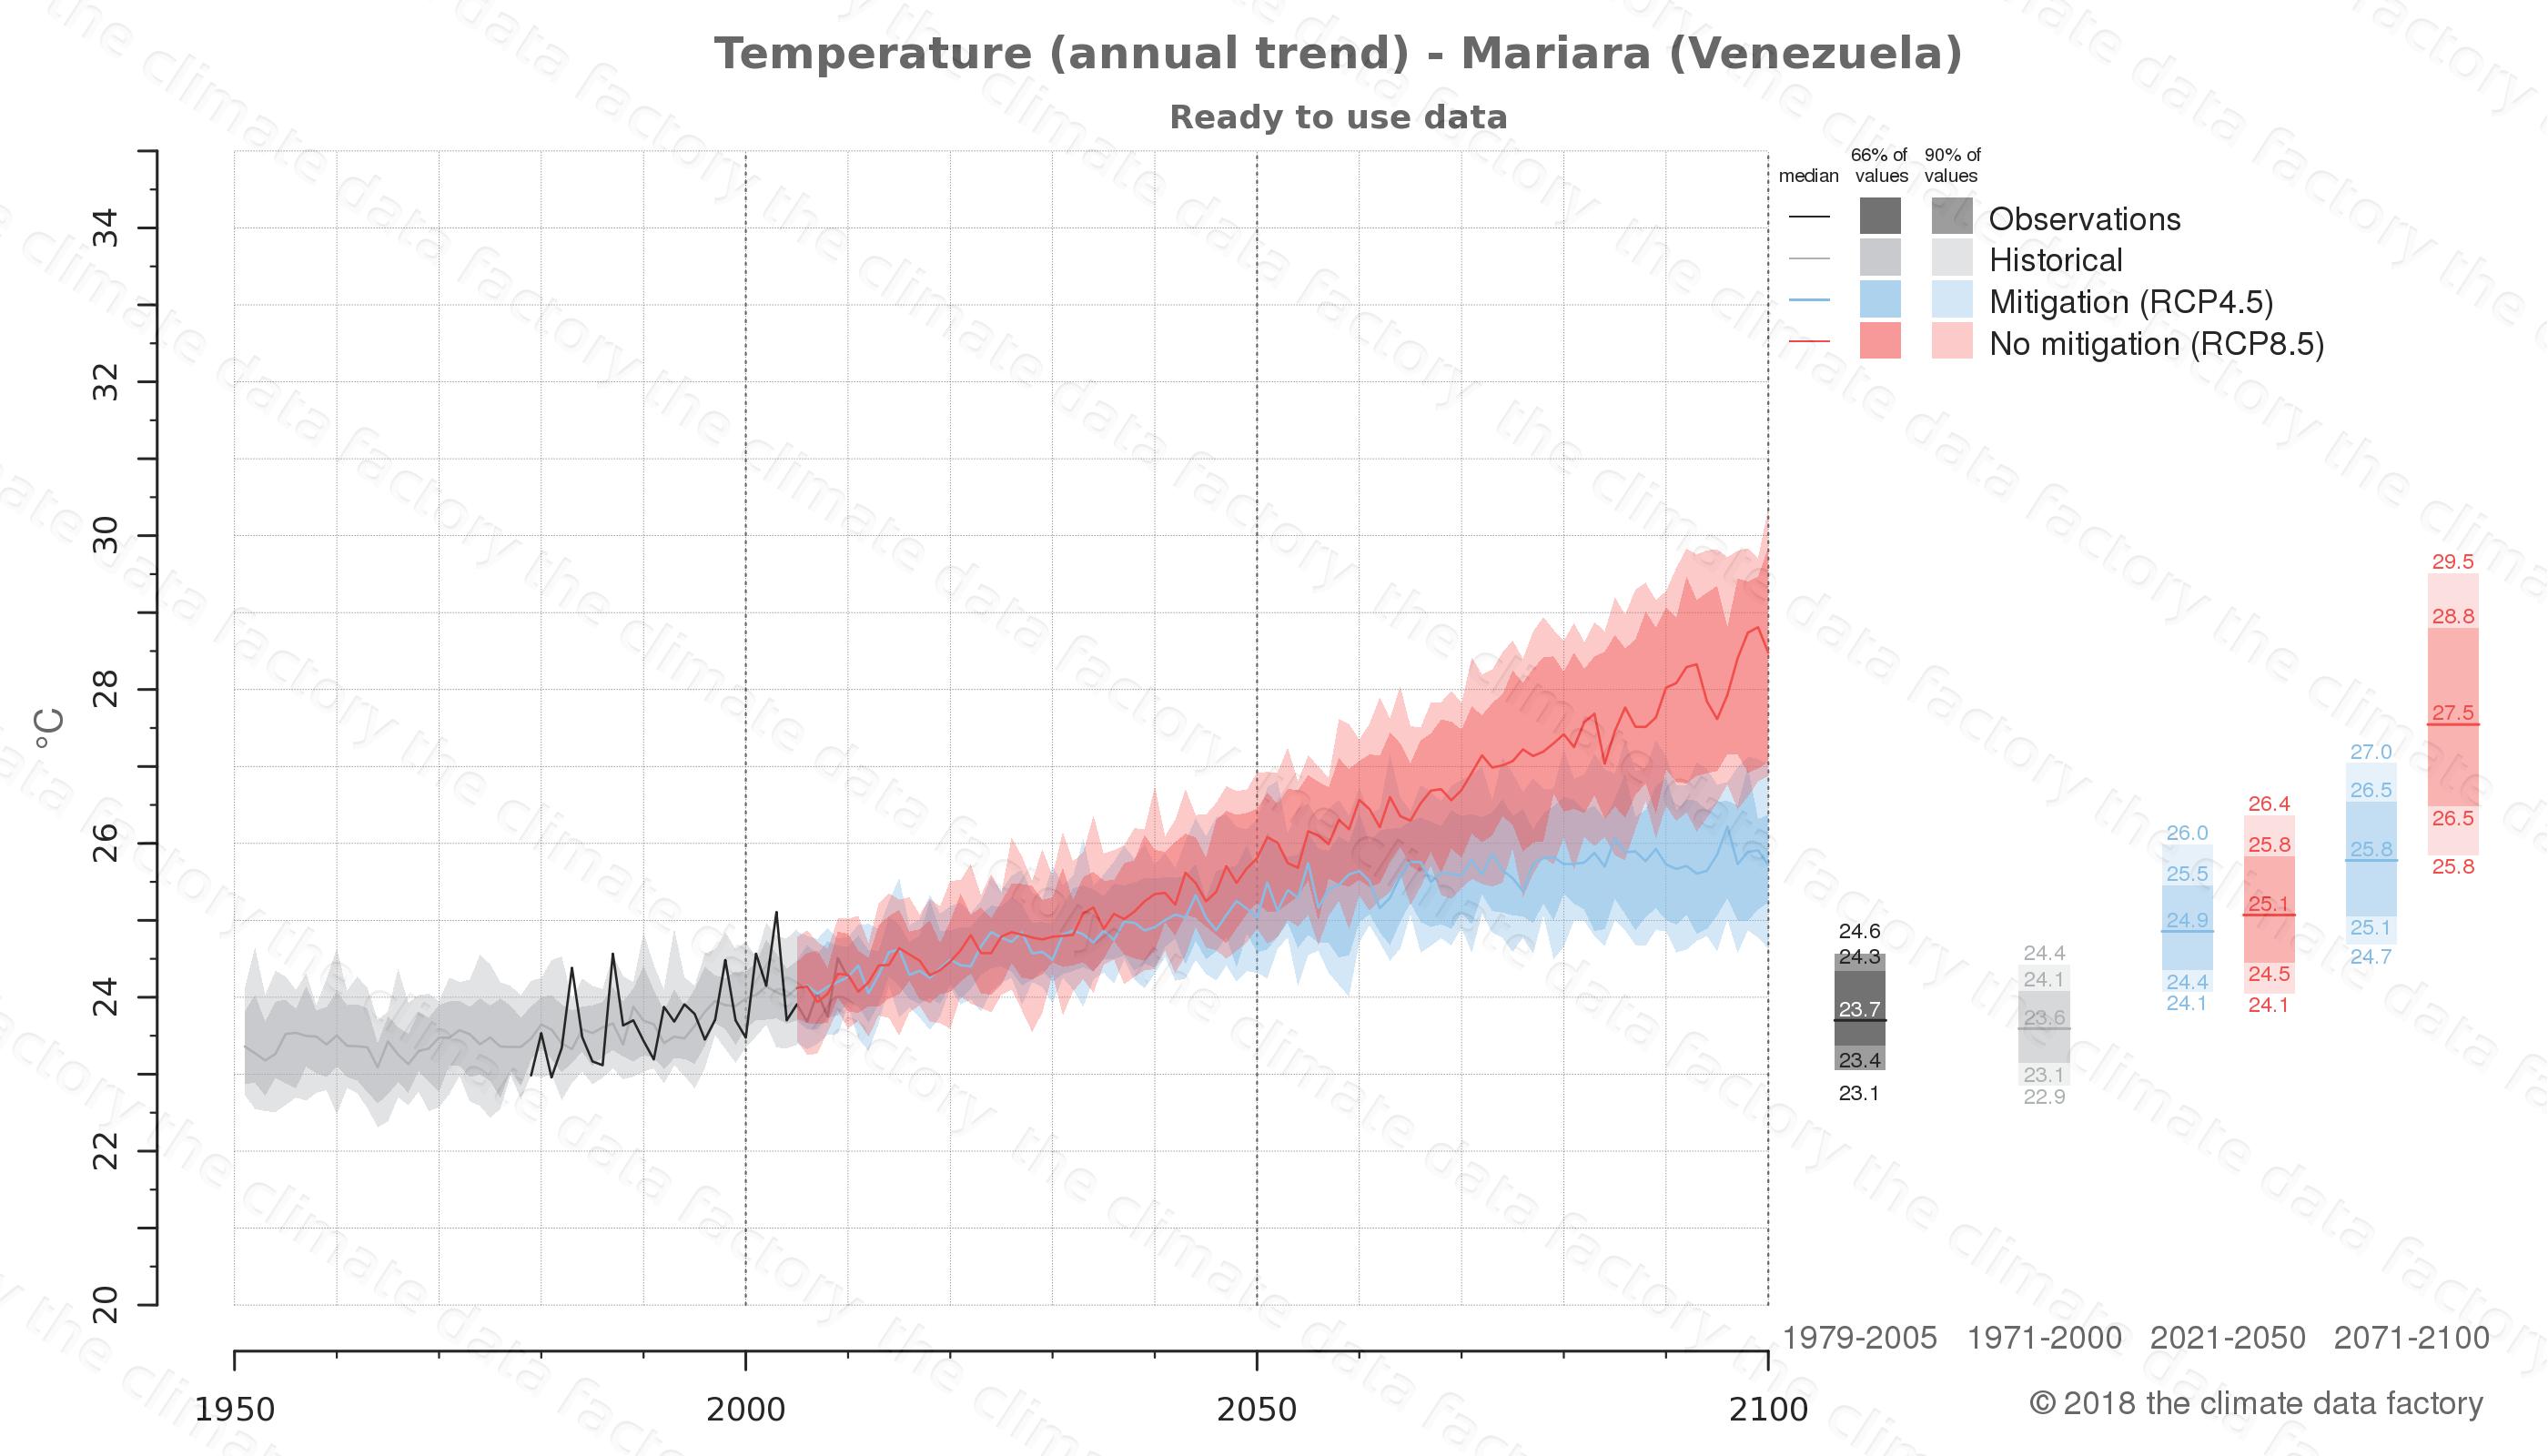 climate change data policy adaptation climate graph city data temperature mariara venezuela